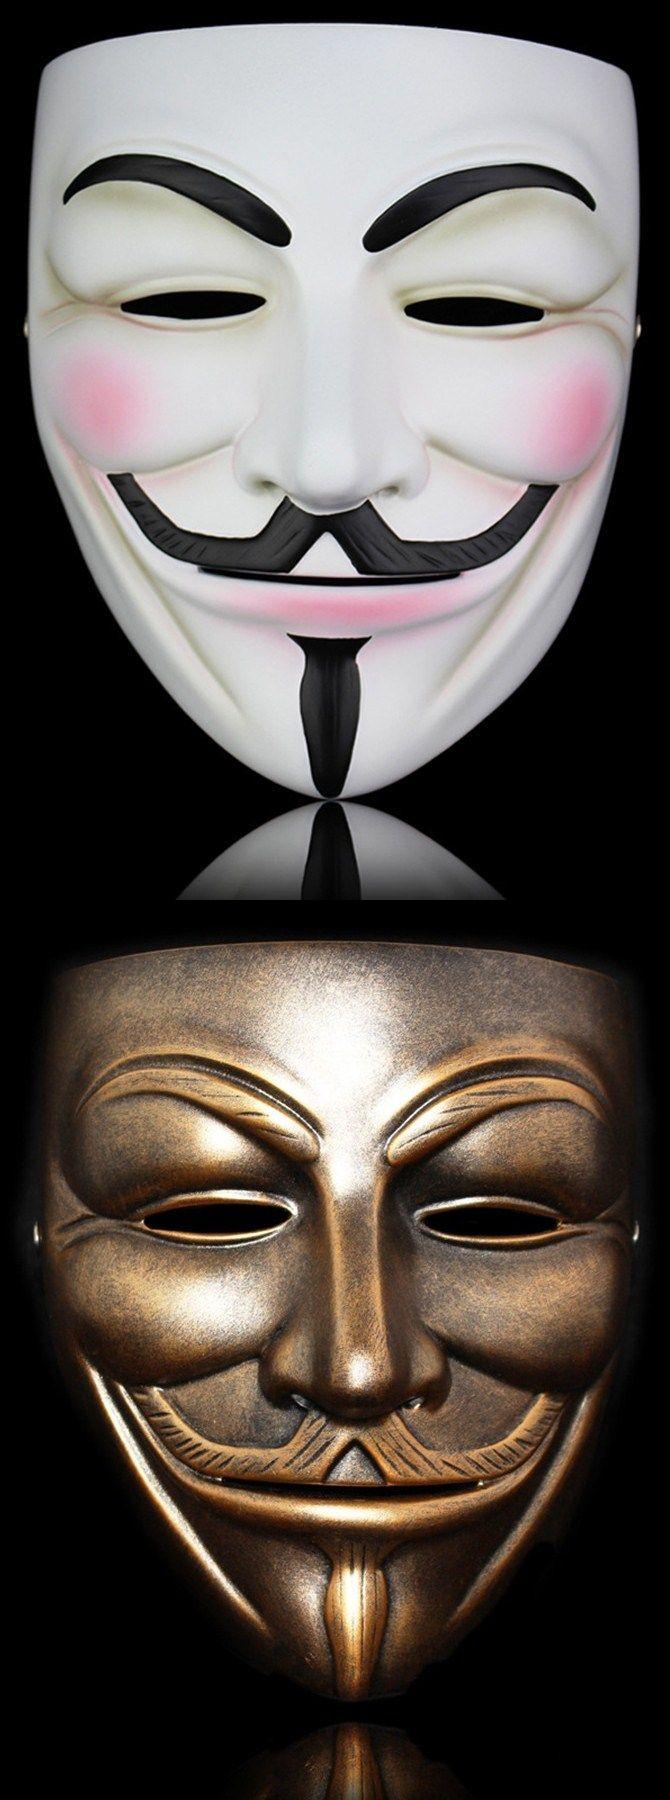 halloween mask, V for Vendetta Mask, funny halloween masks